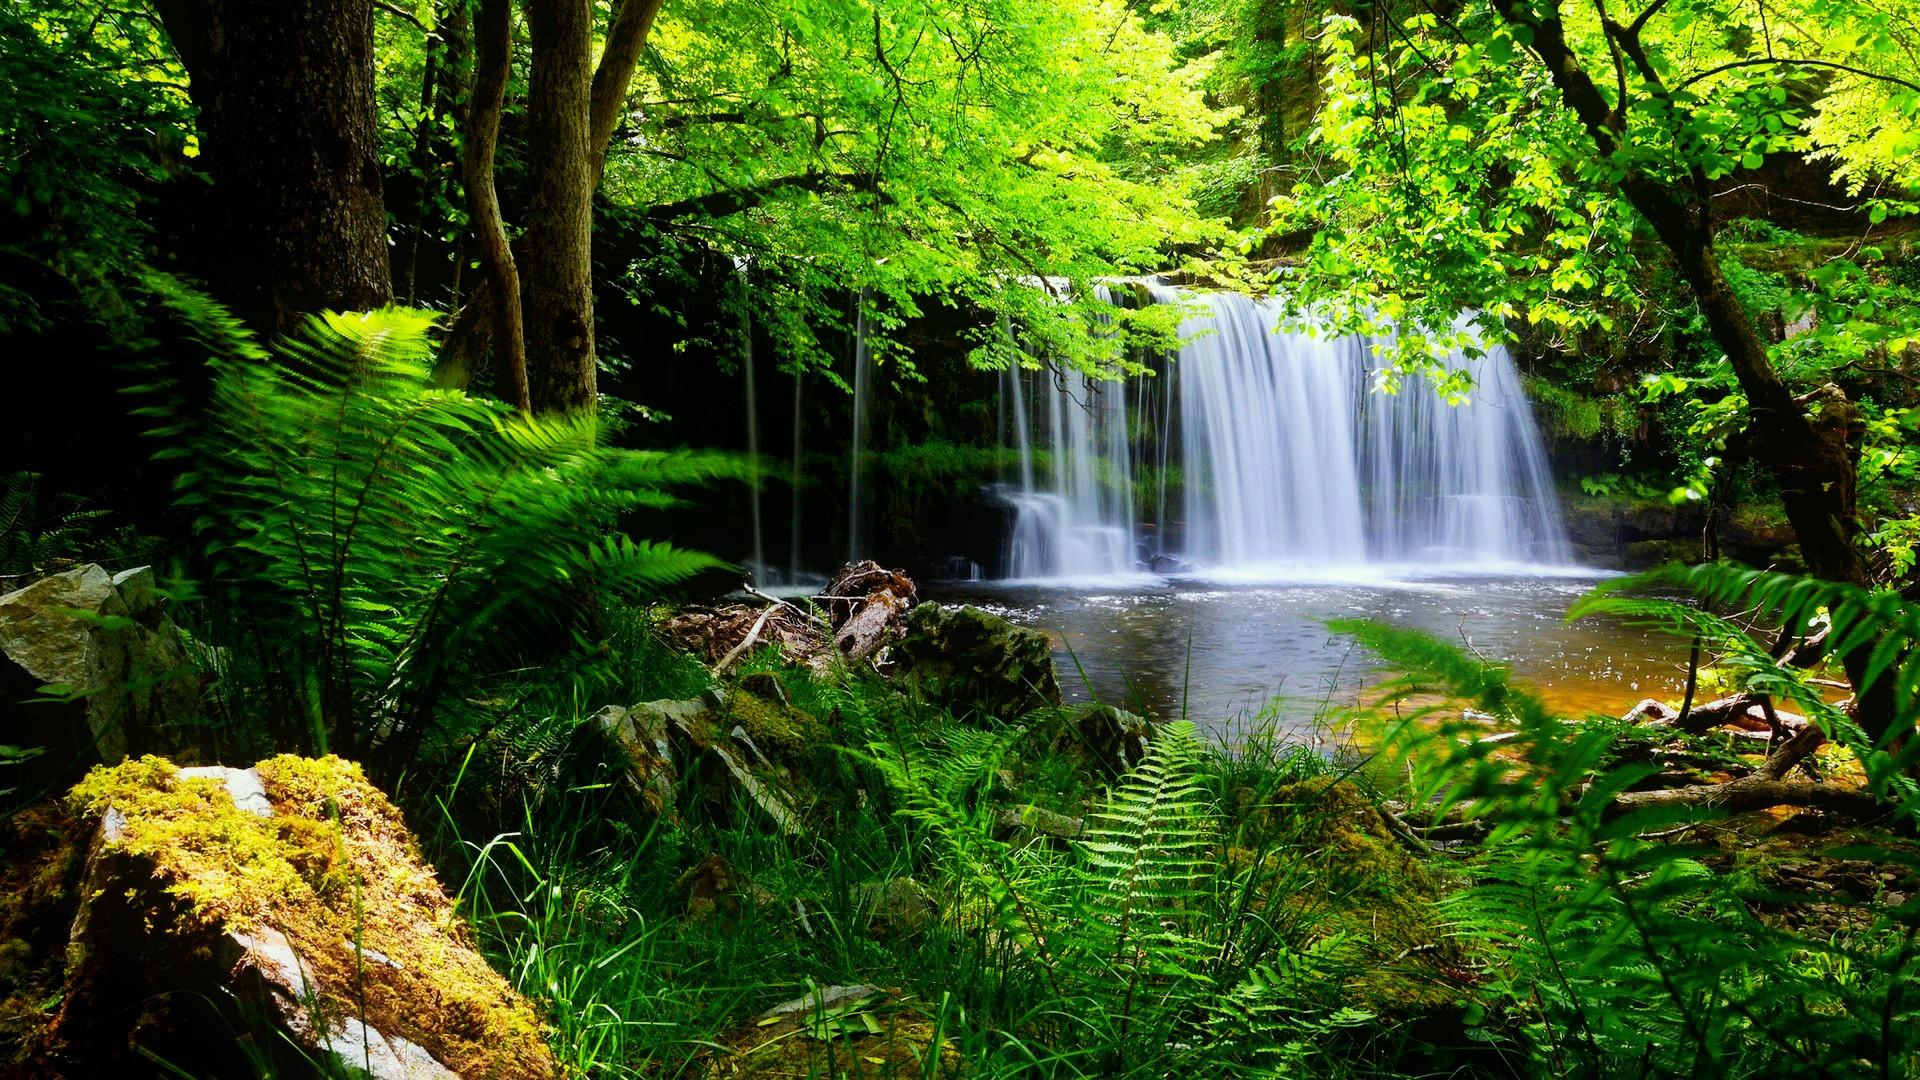 Hd Nature Wallpapers, Landscape, Green, Cute Desktop - Waterfall Desktop Backgrounds - HD Wallpaper